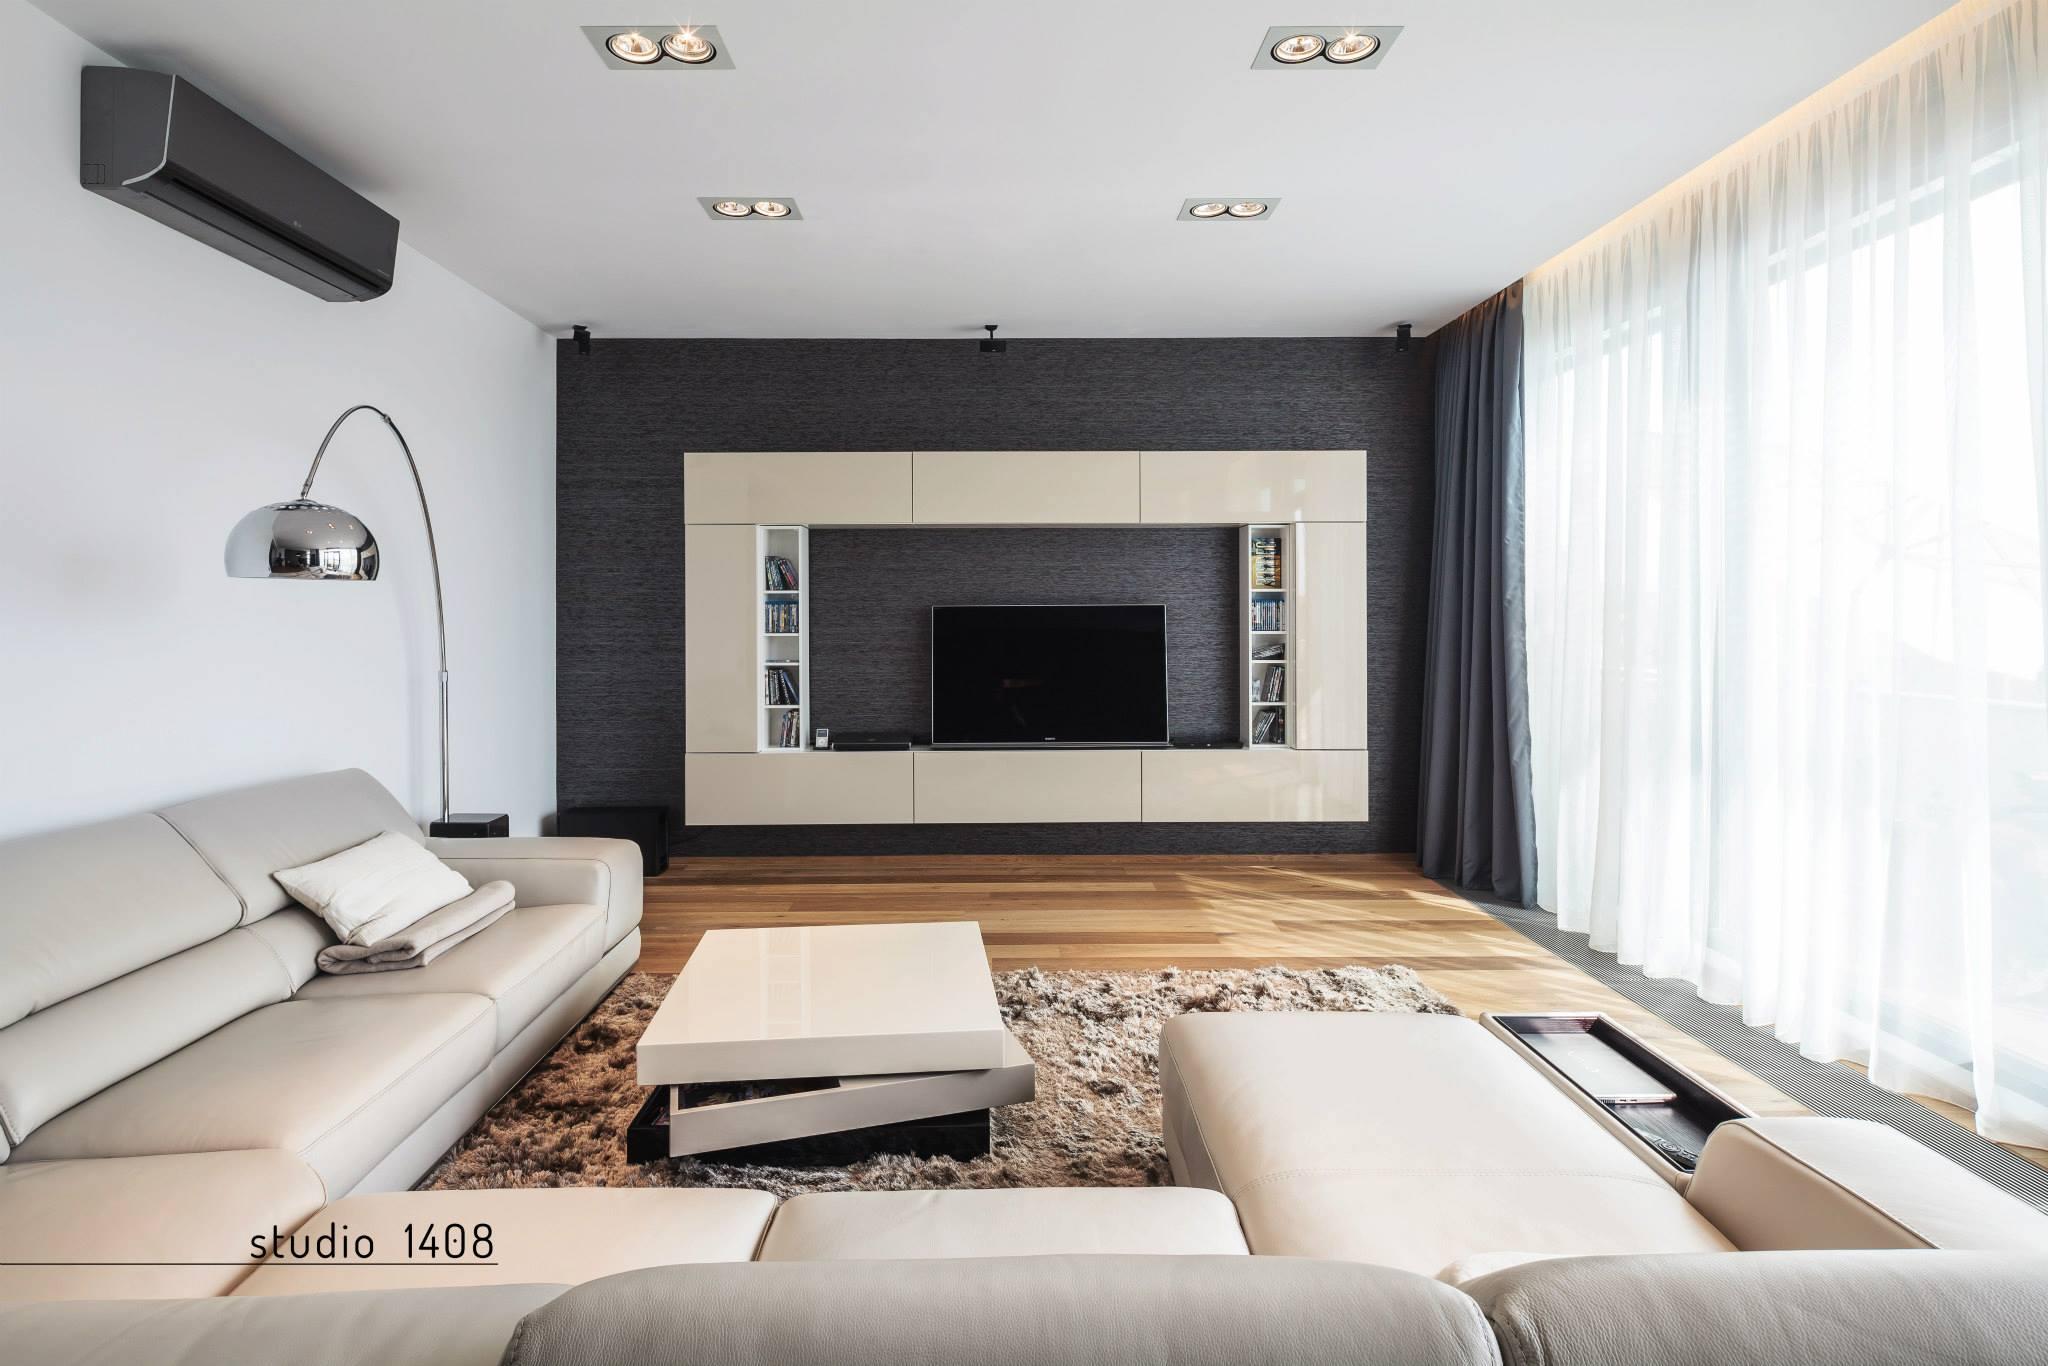 modern design like architecture u0026 interior design? follow us.. YOJBJQU